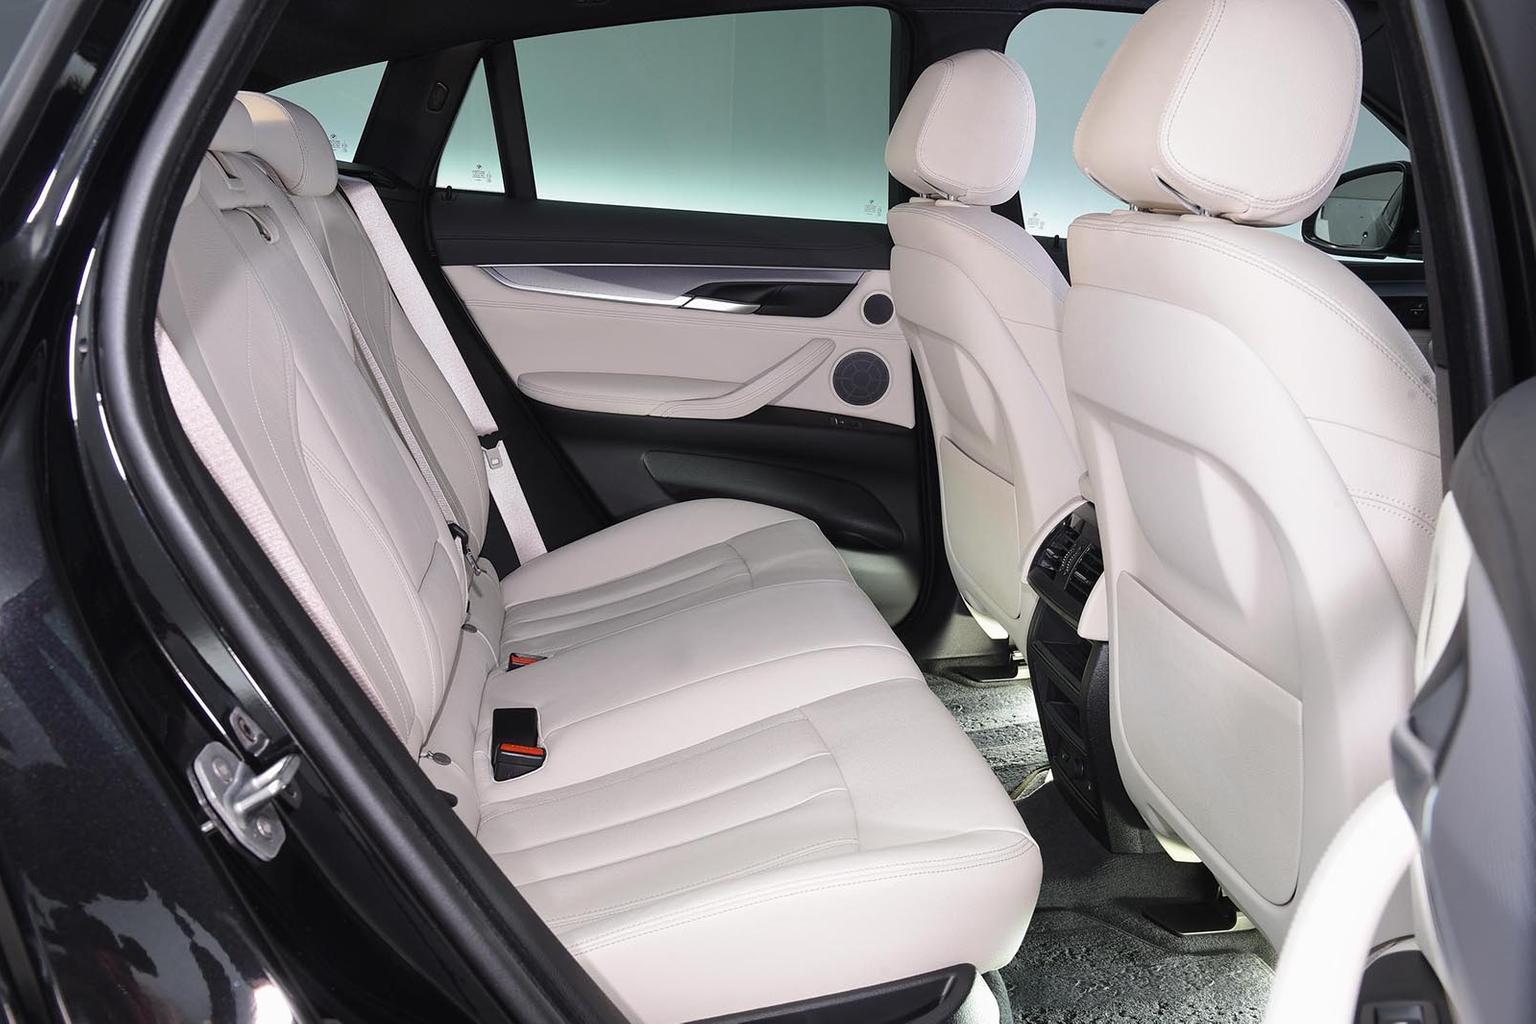 New Range Rover Velar & Audi SQ7 vs BMW X6